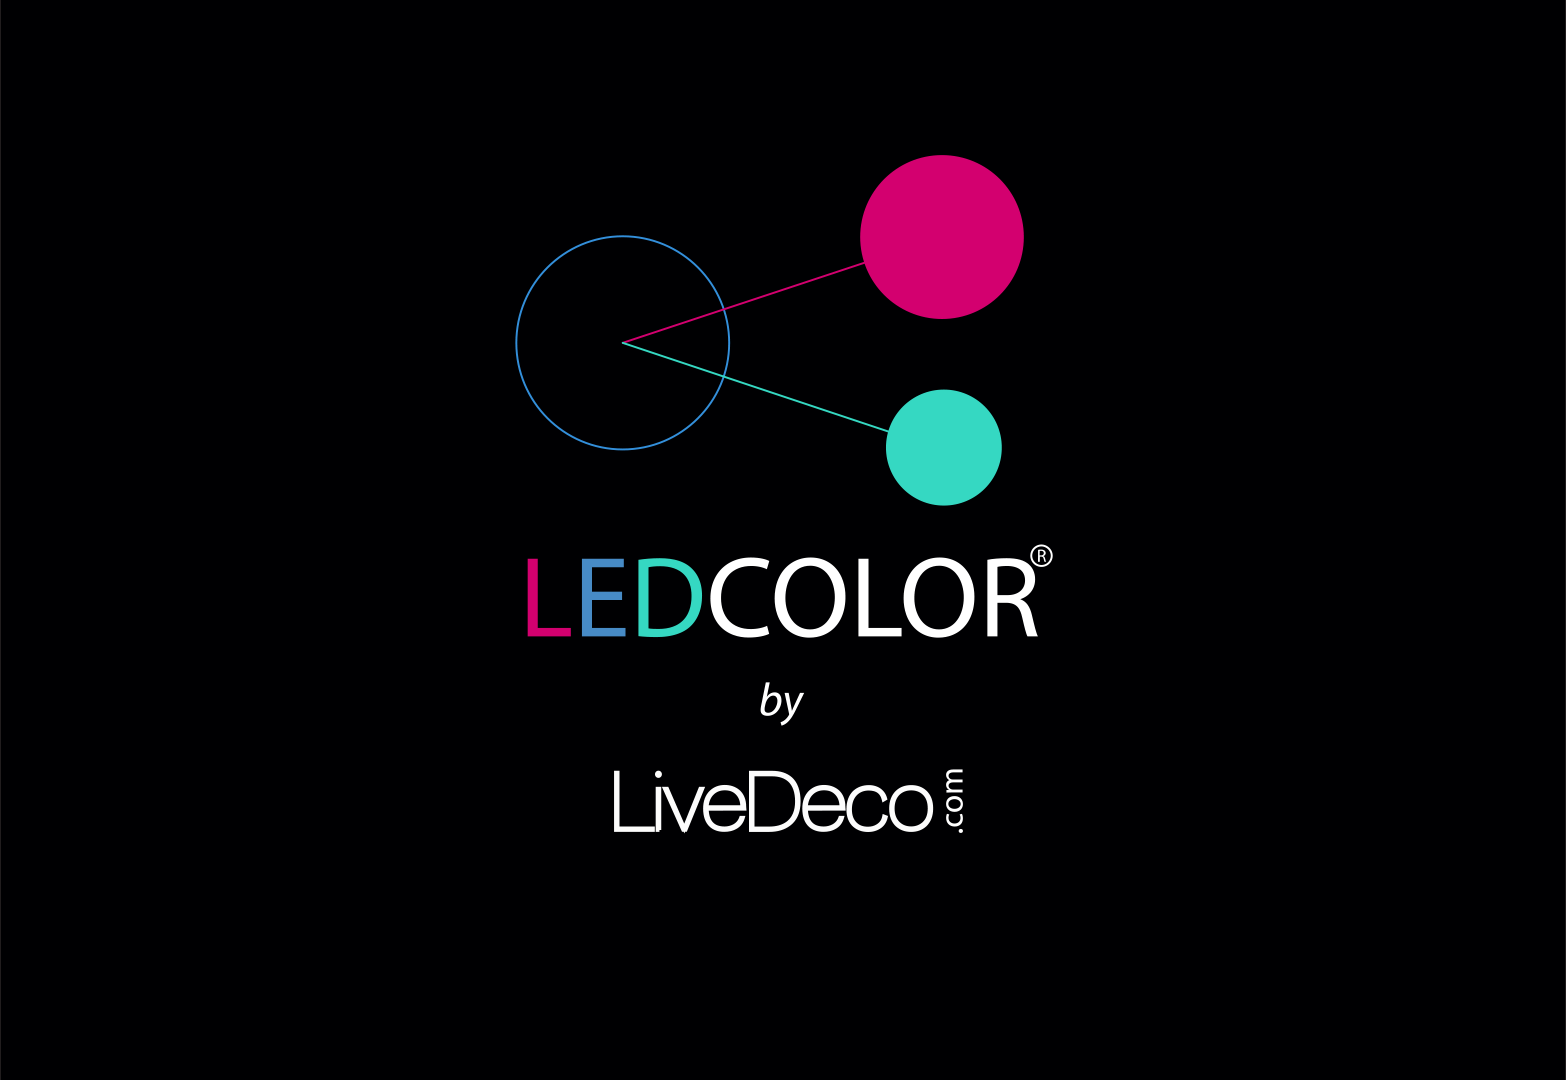 LEDCOLOR logo